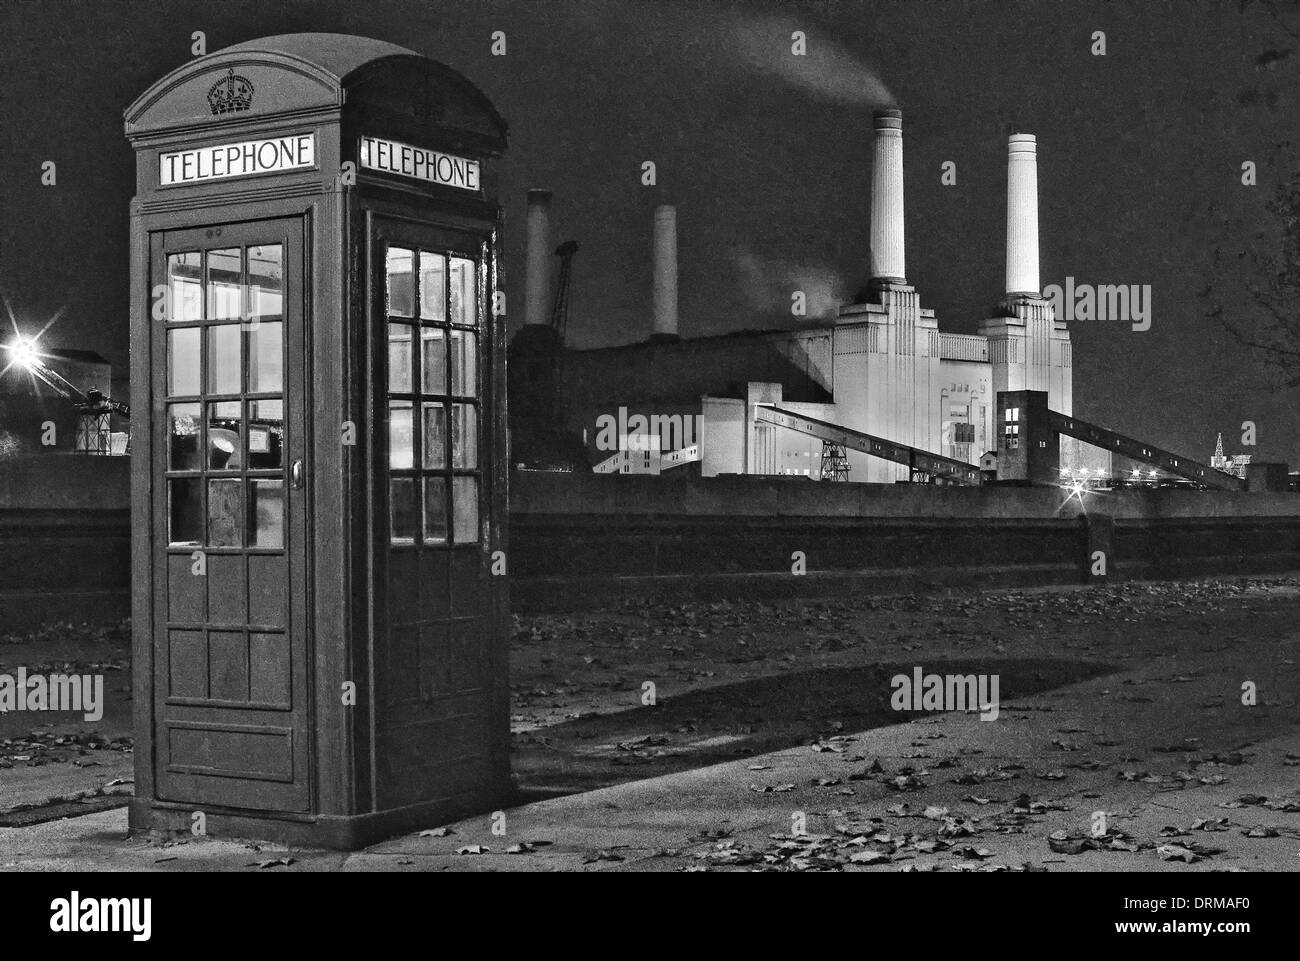 Battersea Power Station, London, England, UK - Stock Image